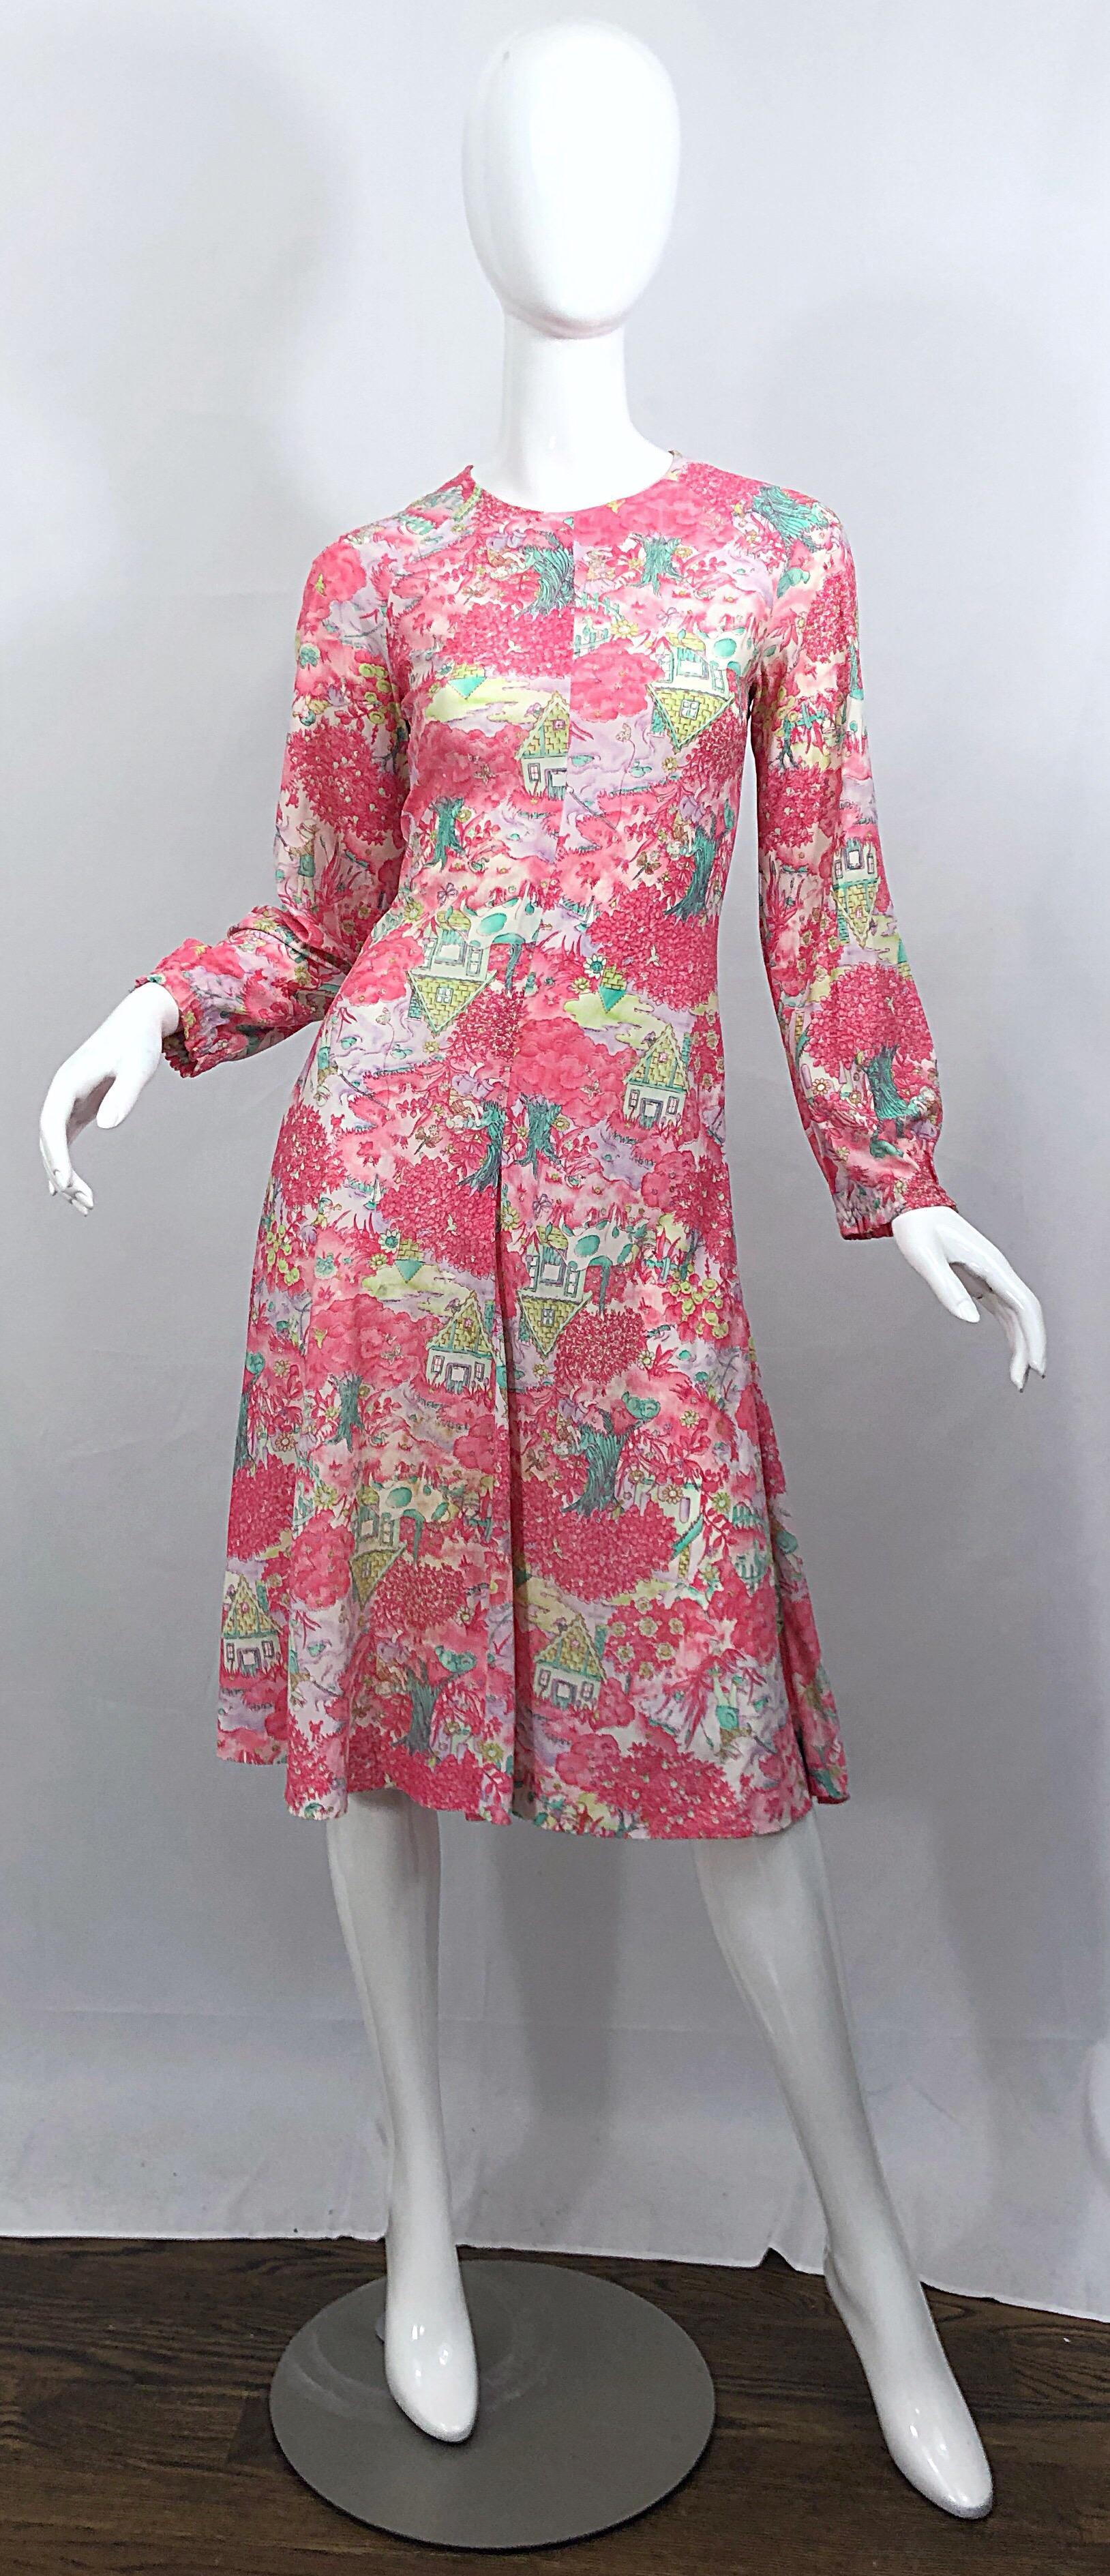 3 4 Knit Jersey Dresses Sleeve